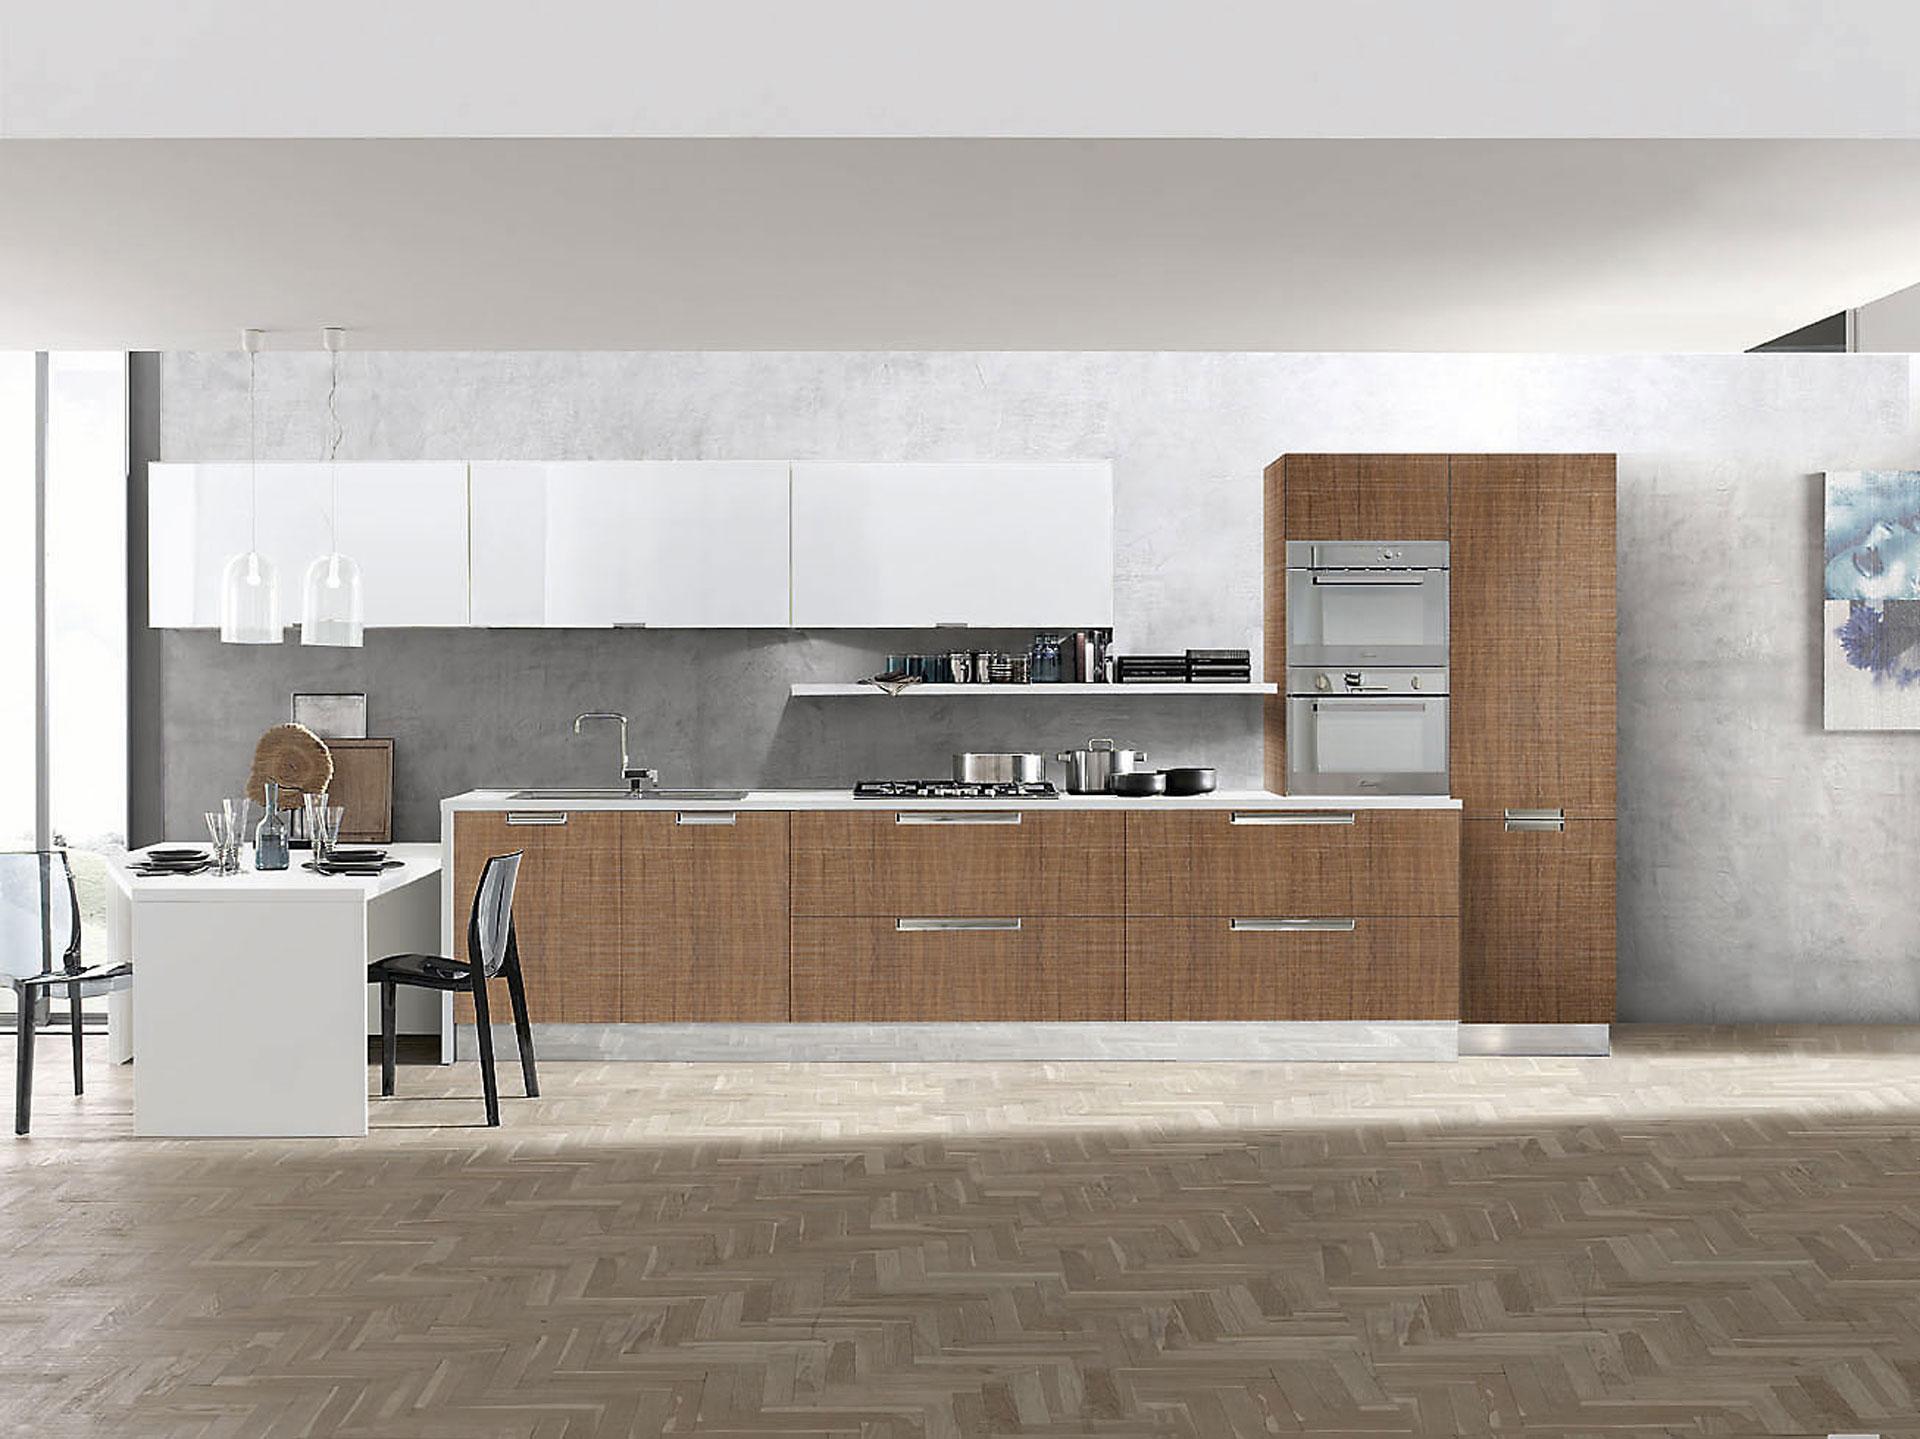 Cucine soluzioni d 39 arredosoluzioni d 39 arredo - Progettazione cucine on line ...